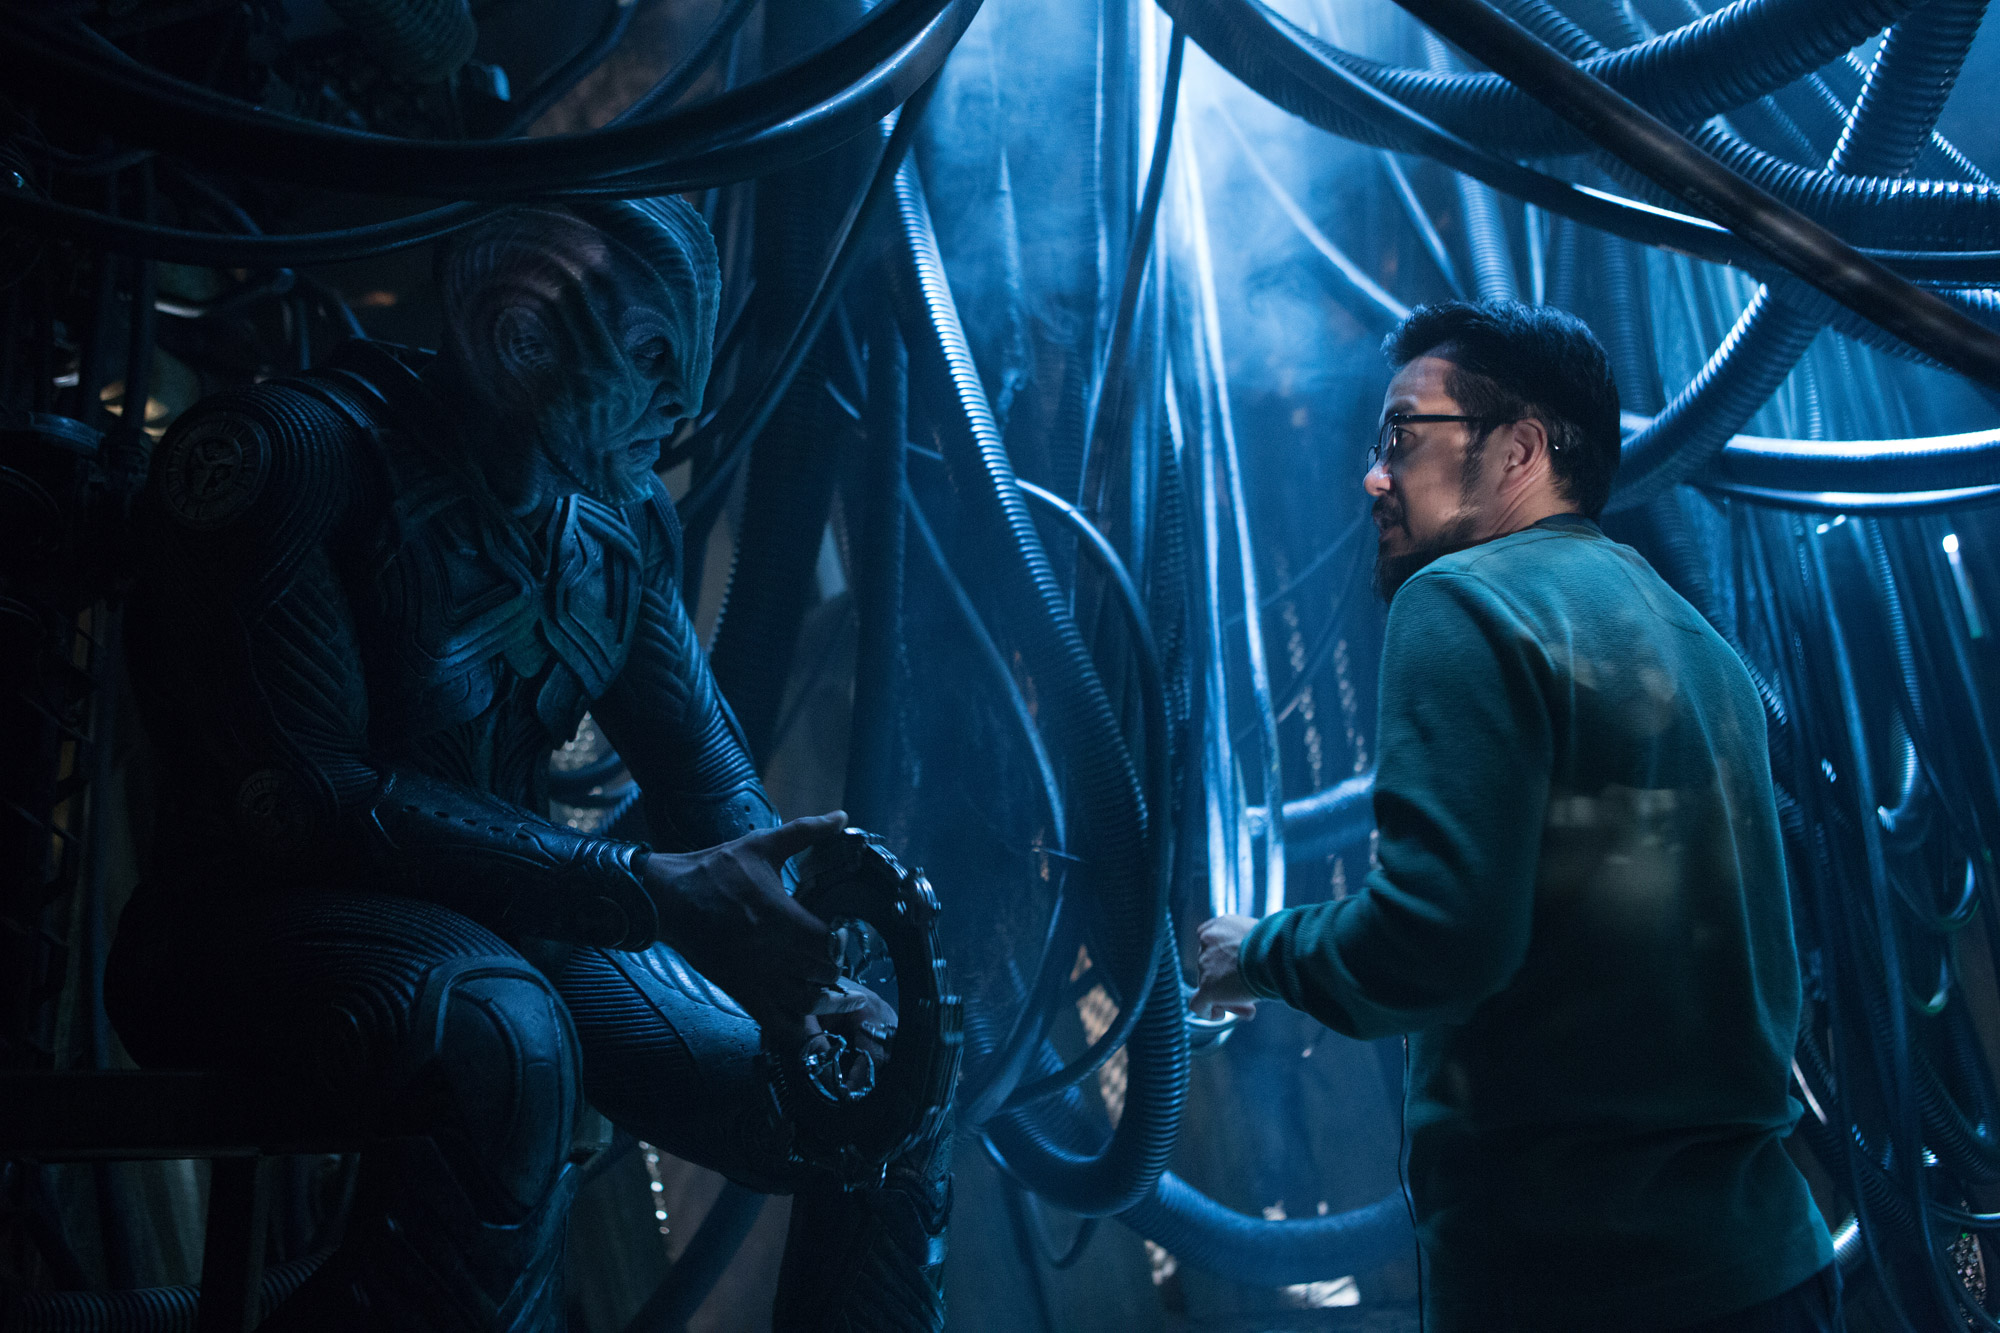 Idris Elba (Krall) am Set mit Regisseur Justin Lin. Foto: Paramount Pictures